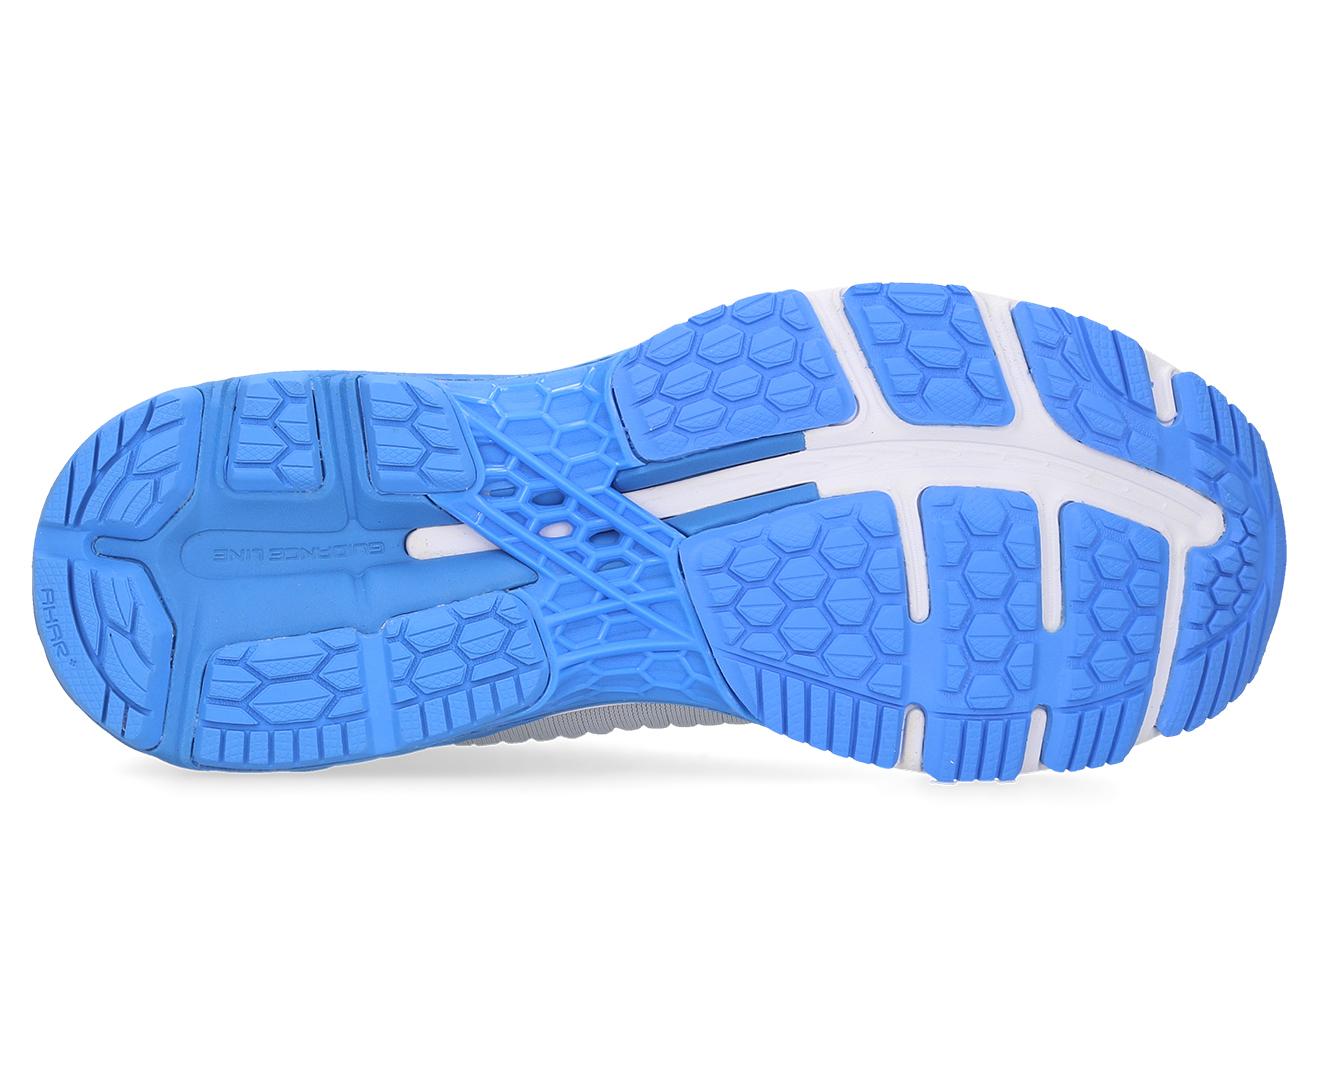 3ac27974c68a ASICS Women's GEL-Kayano 25 Shoe - Mid Grey/Blue Coast | Catch.com.au